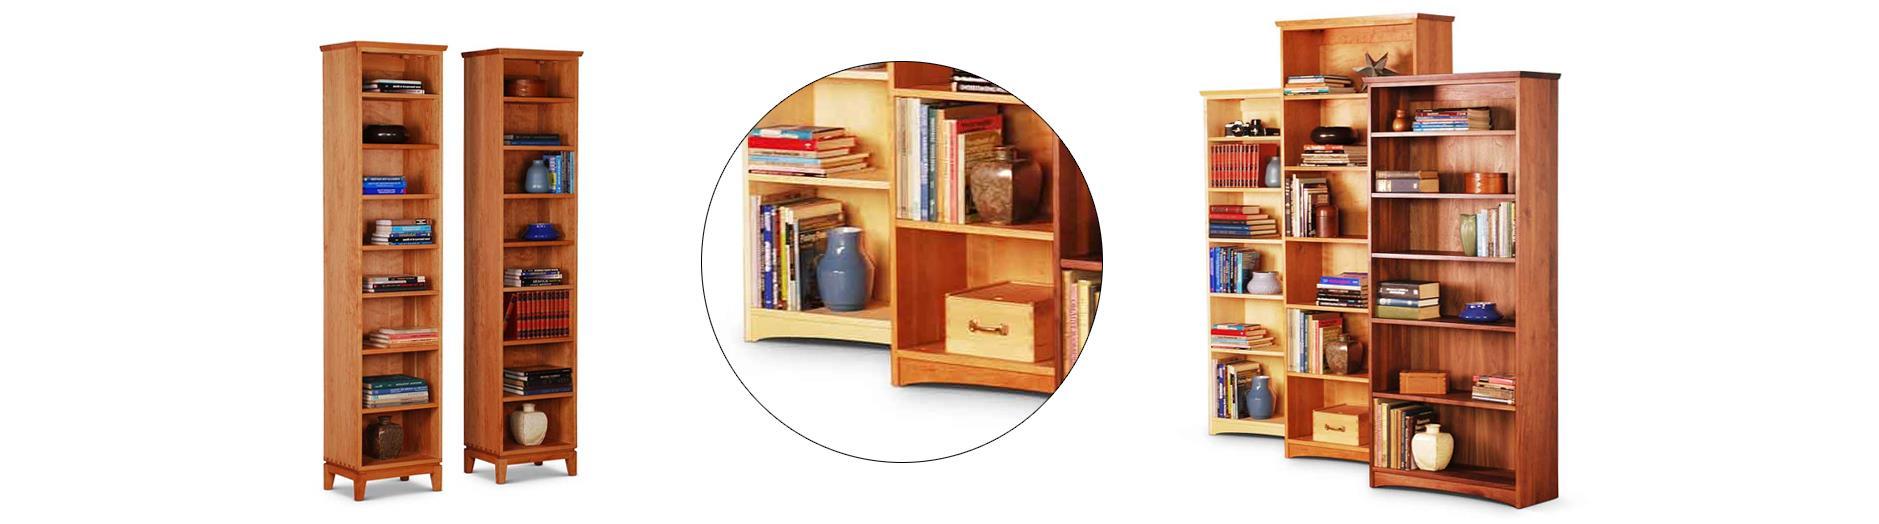 Scott-Jordan-bookcases